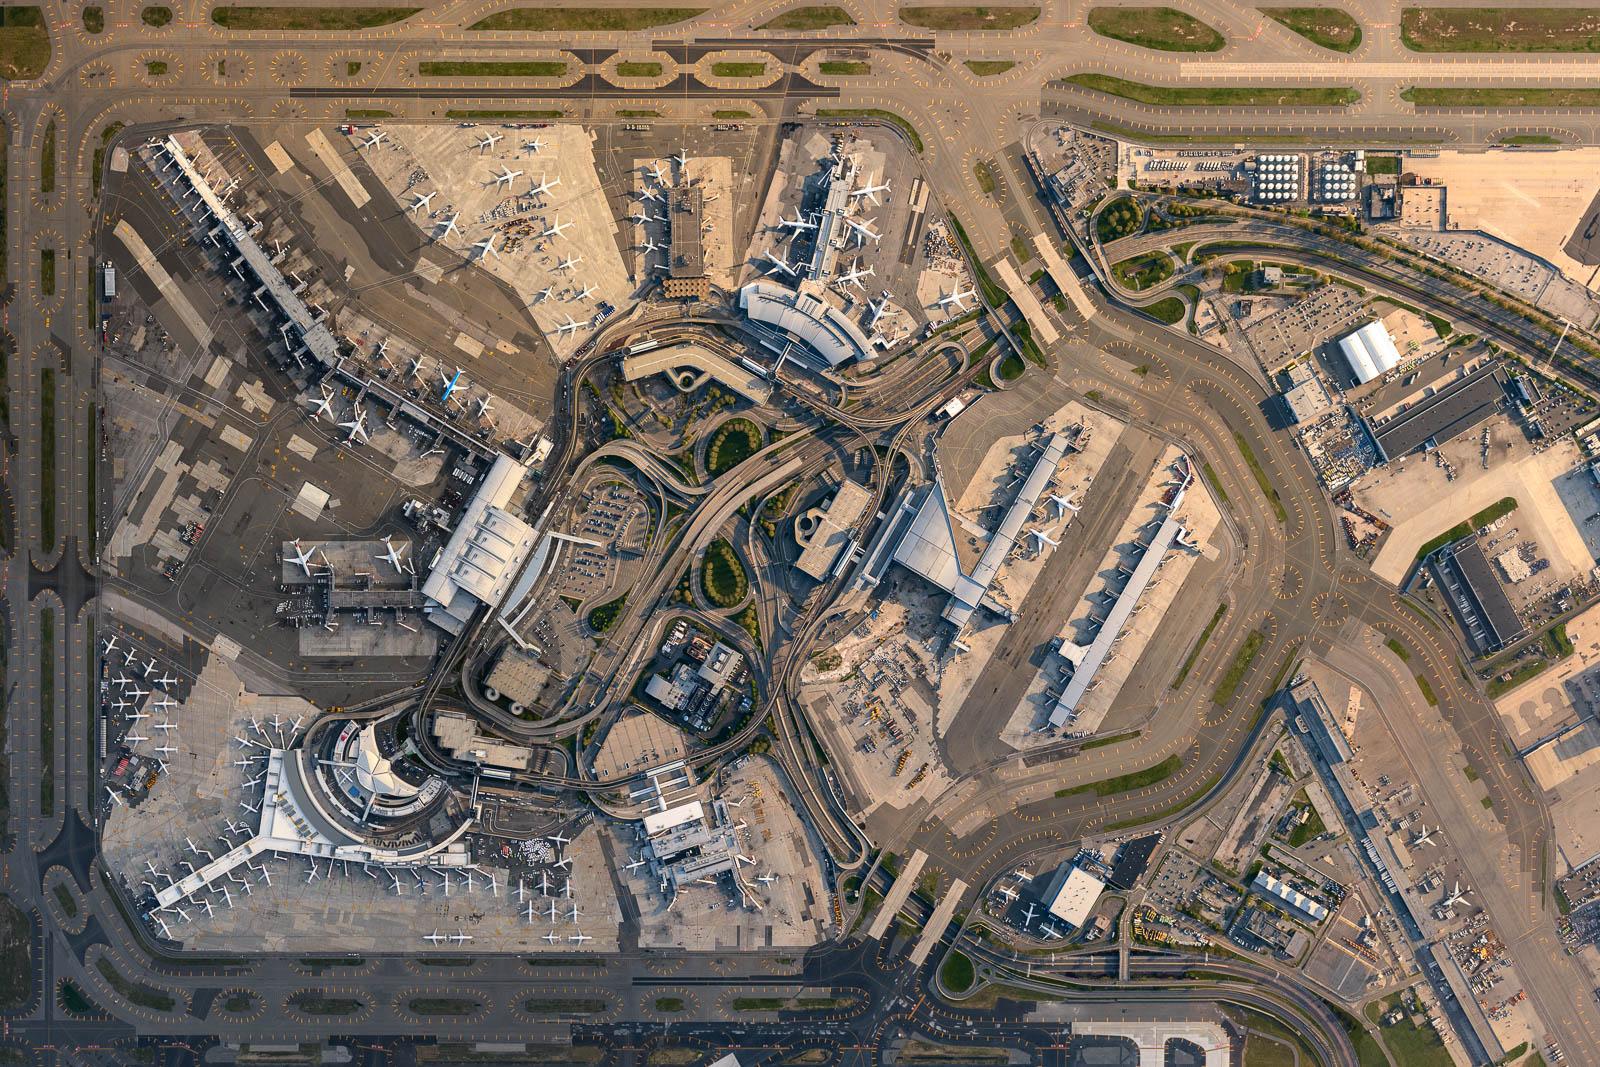 JFK airport during the peak of COVID-19 crisis (May 2020)